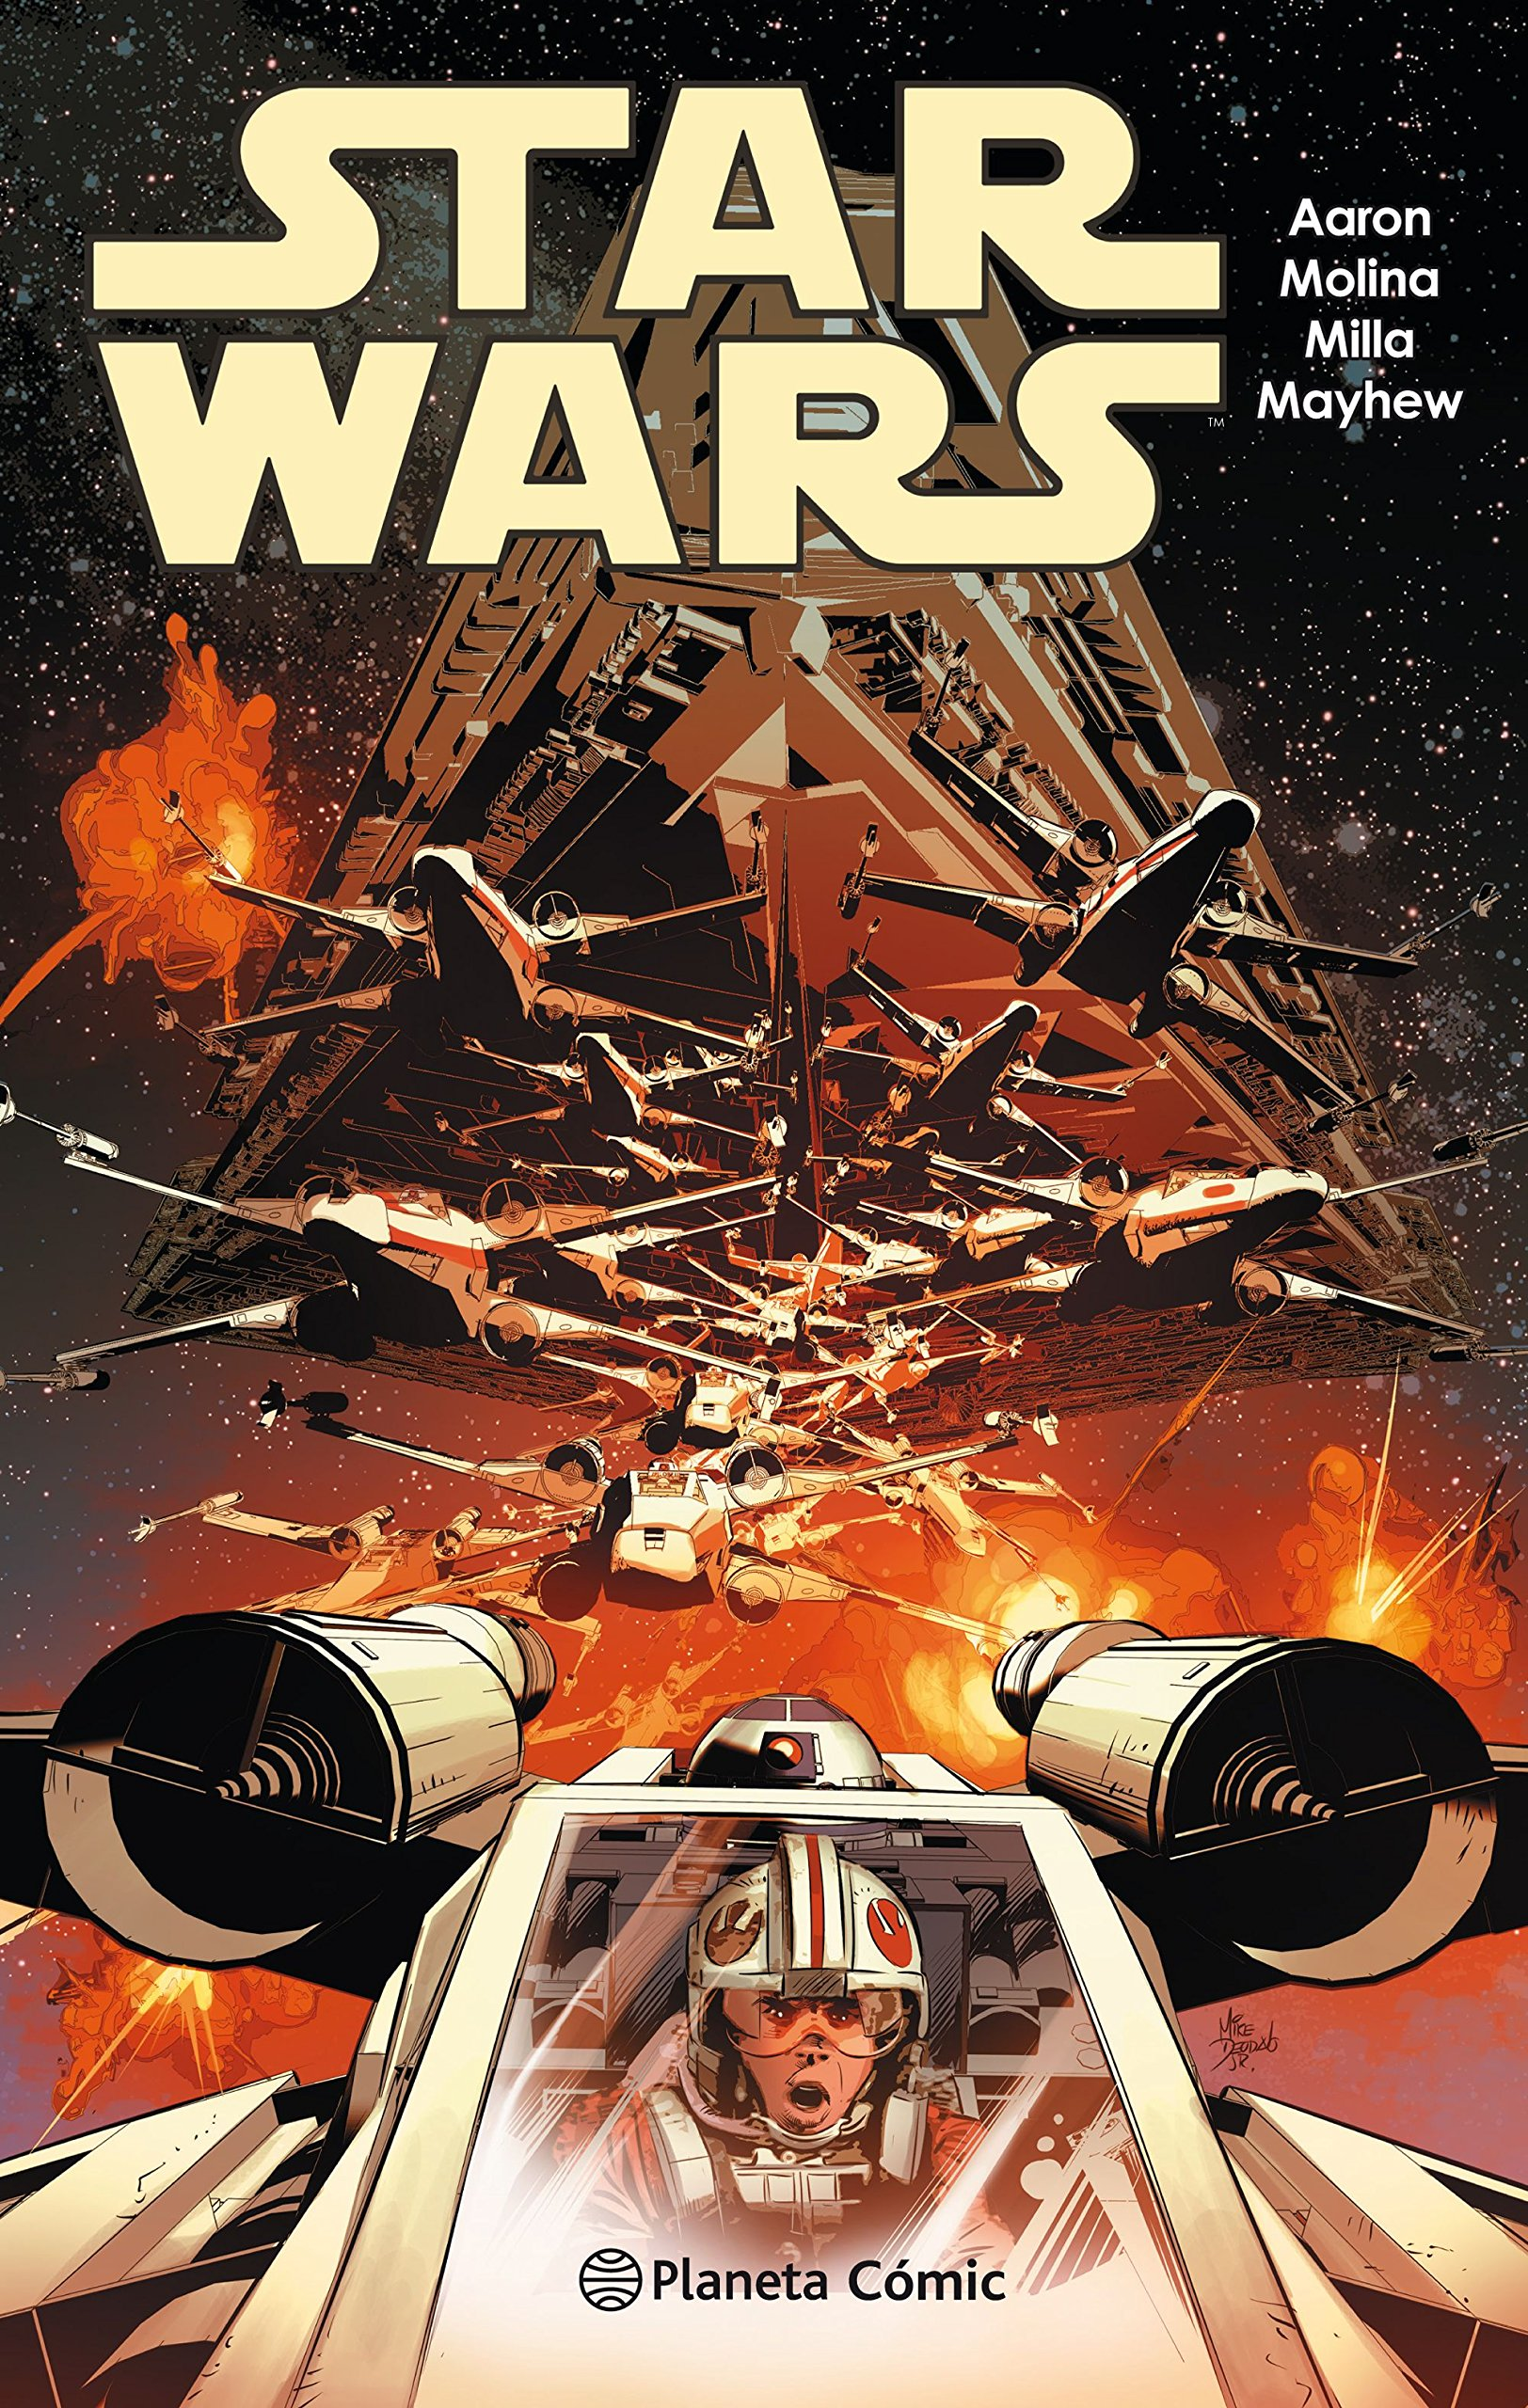 Star Wars (tomo recopilatorio) nº 04 (Star Wars: Recopilatorios Marvel) Tapa dura – 2 oct 2018 Jason Aaron Planeta DeAgostini Cómics 8416051135 Graphic novels